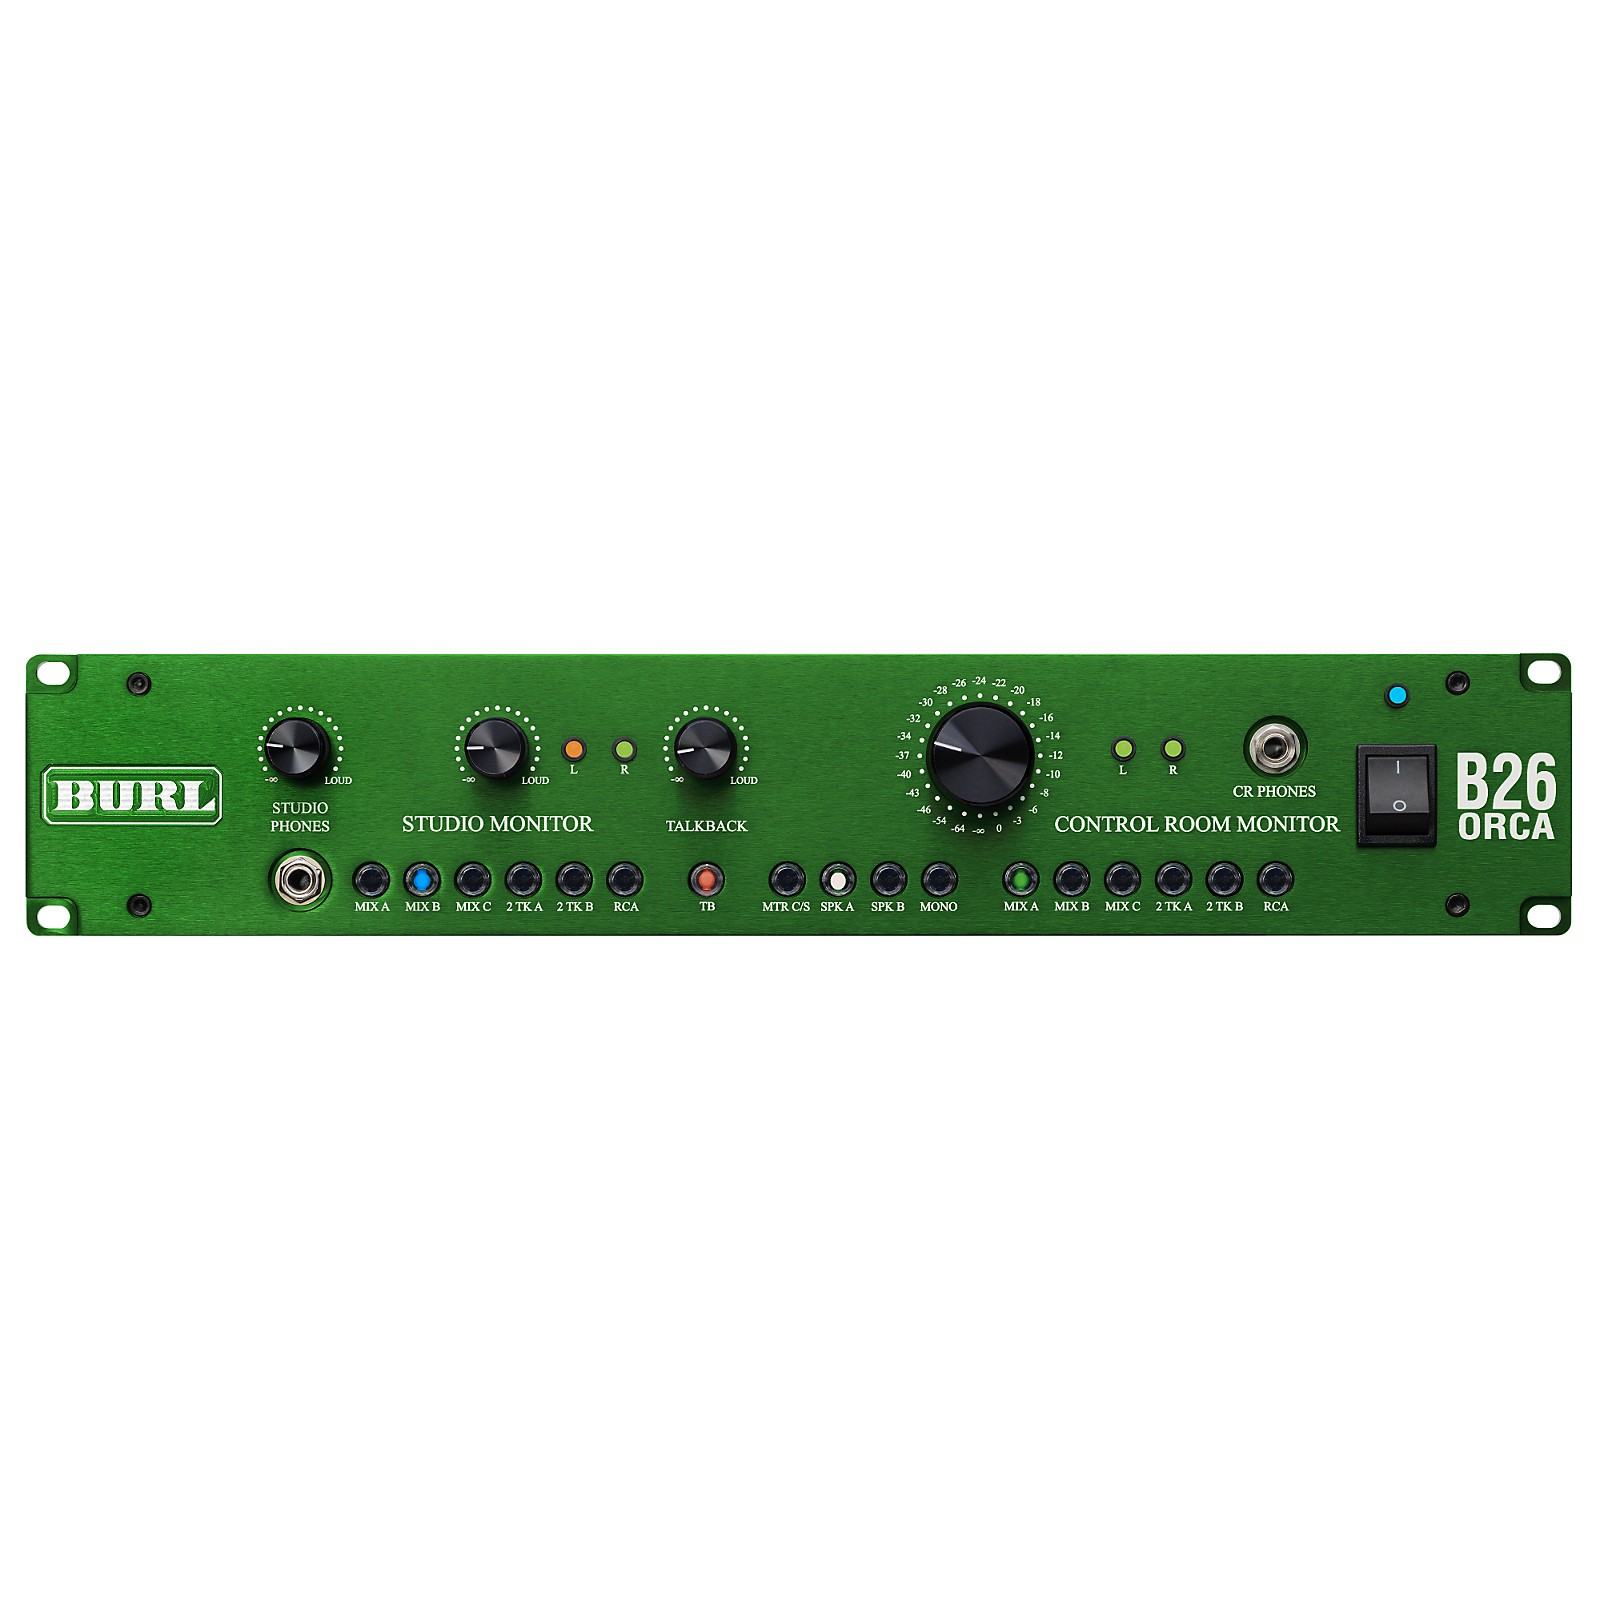 Burl Audio B26 Orca 6 Stereo Input Control Room Monitor